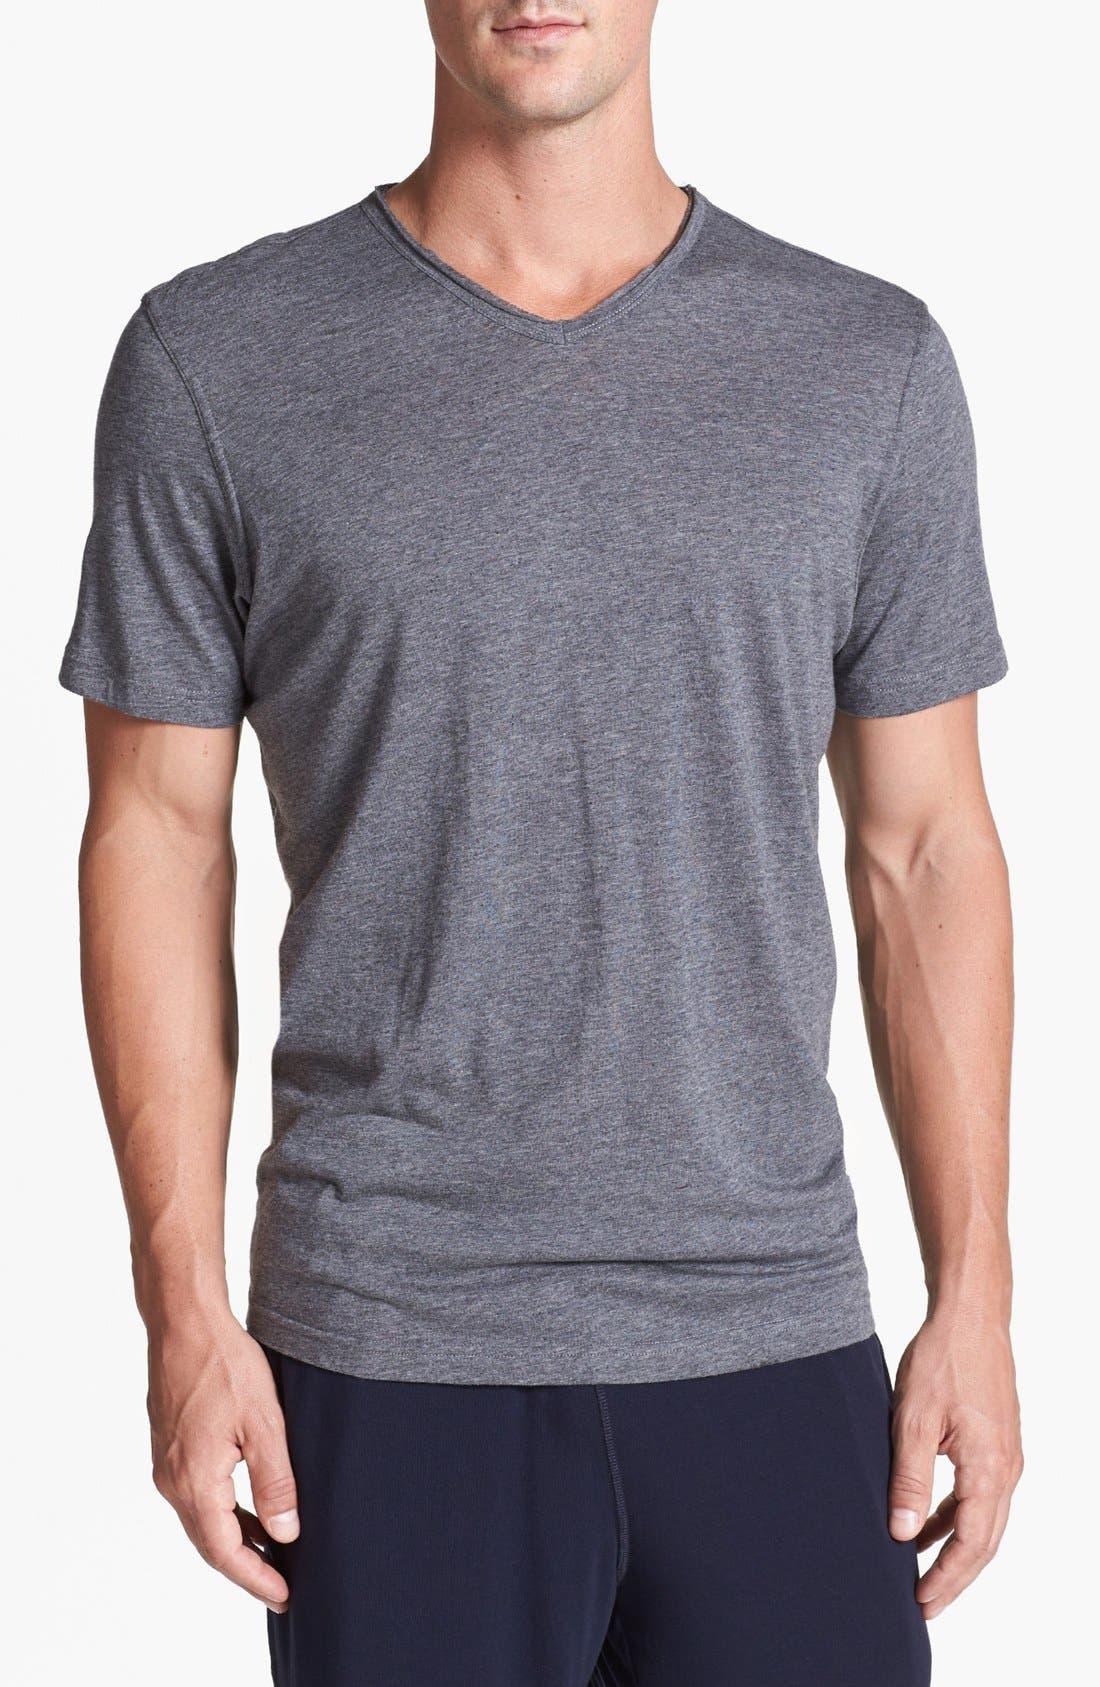 Alternate Image 1 Selected - Daniel Buchler Cotton Blend V-Neck T-Shirt